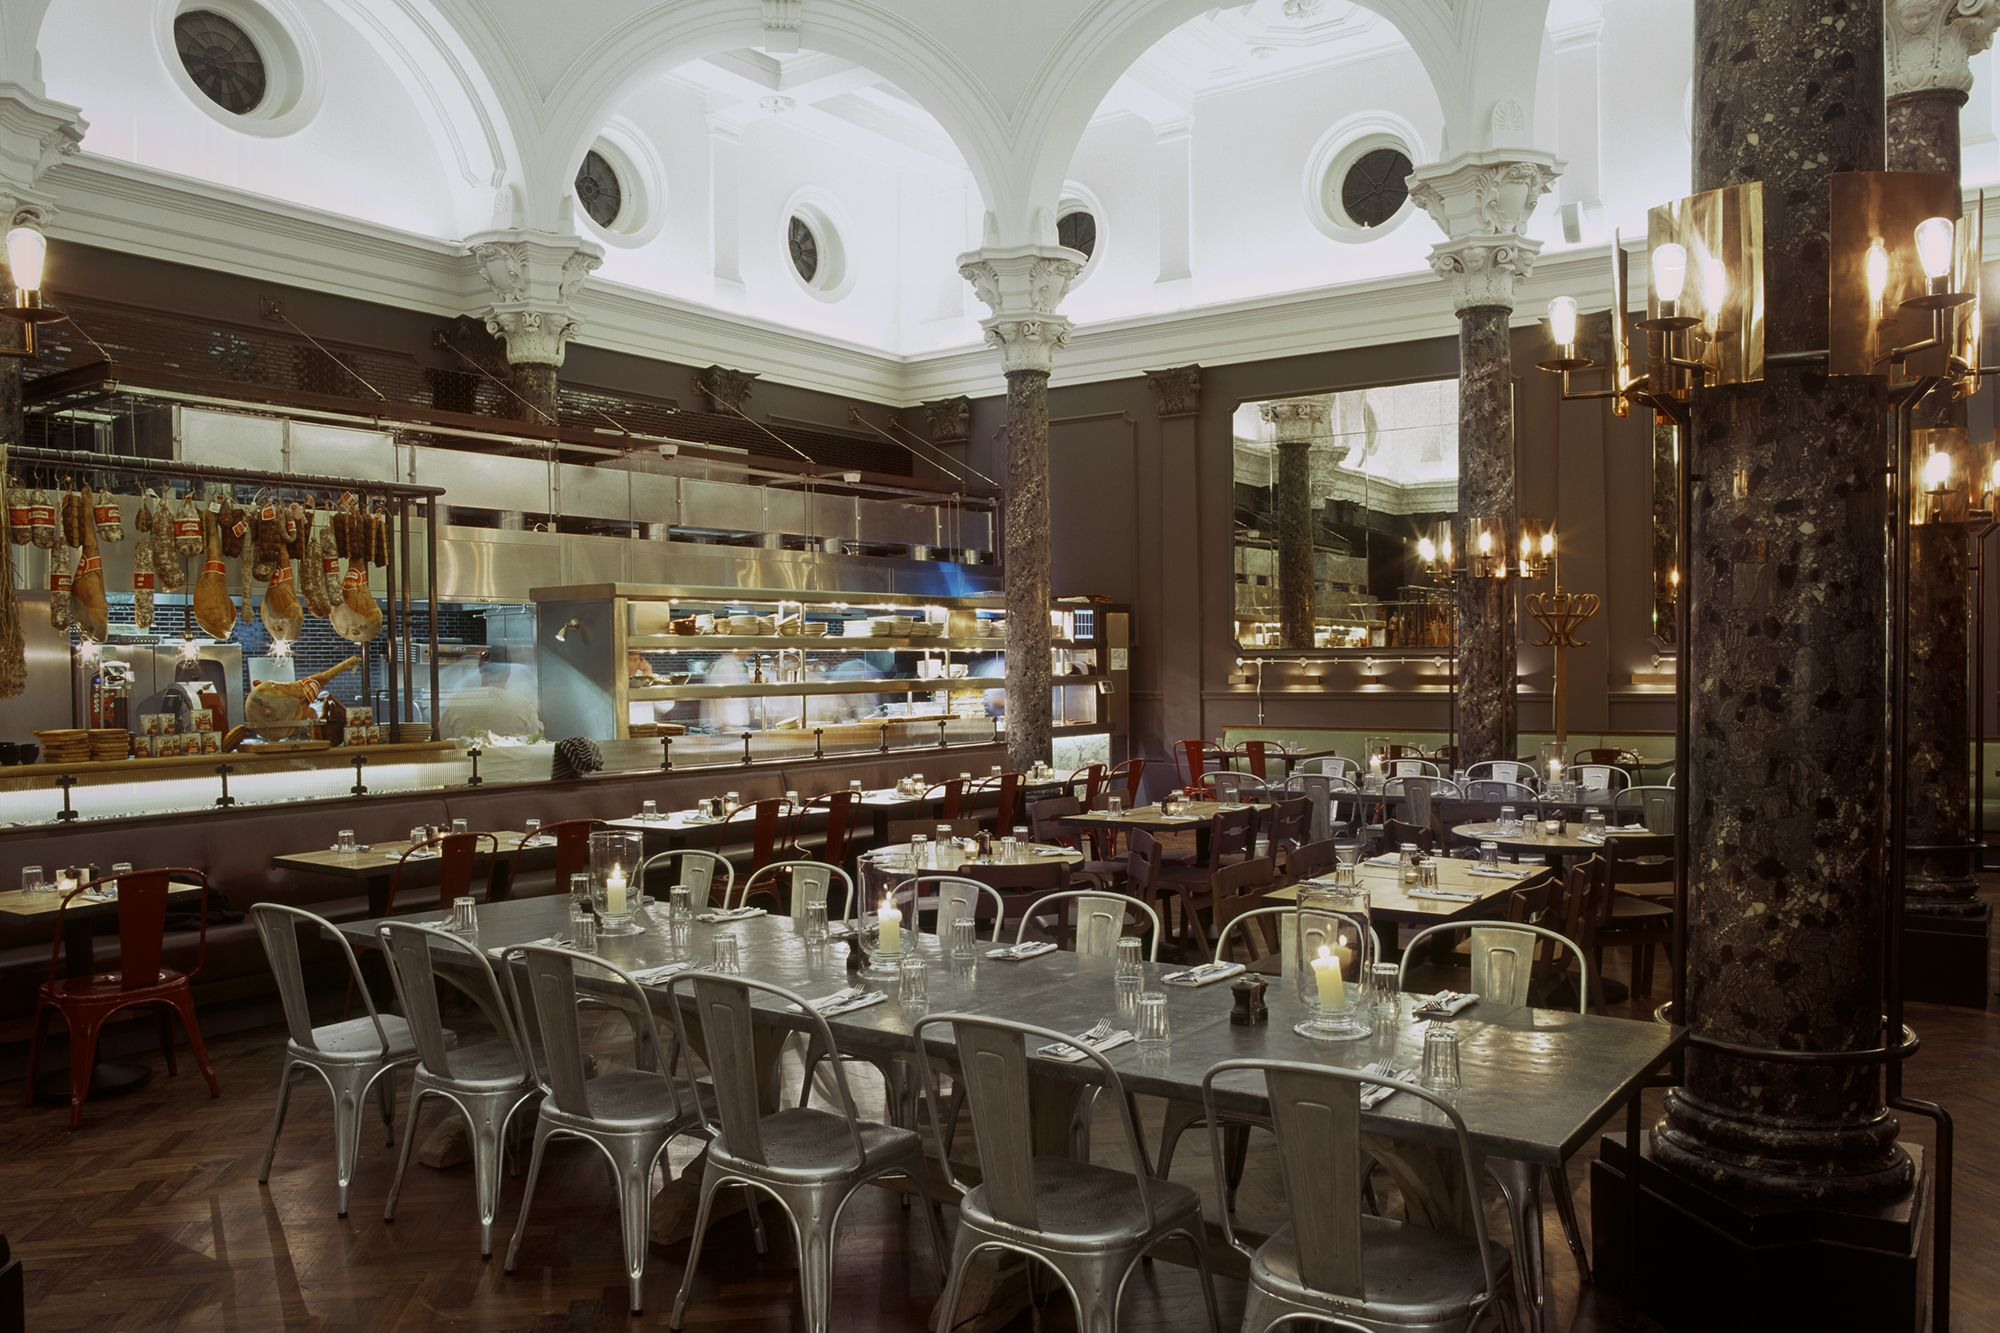 antipasti bar and open kitchen in the cambridge restaurant